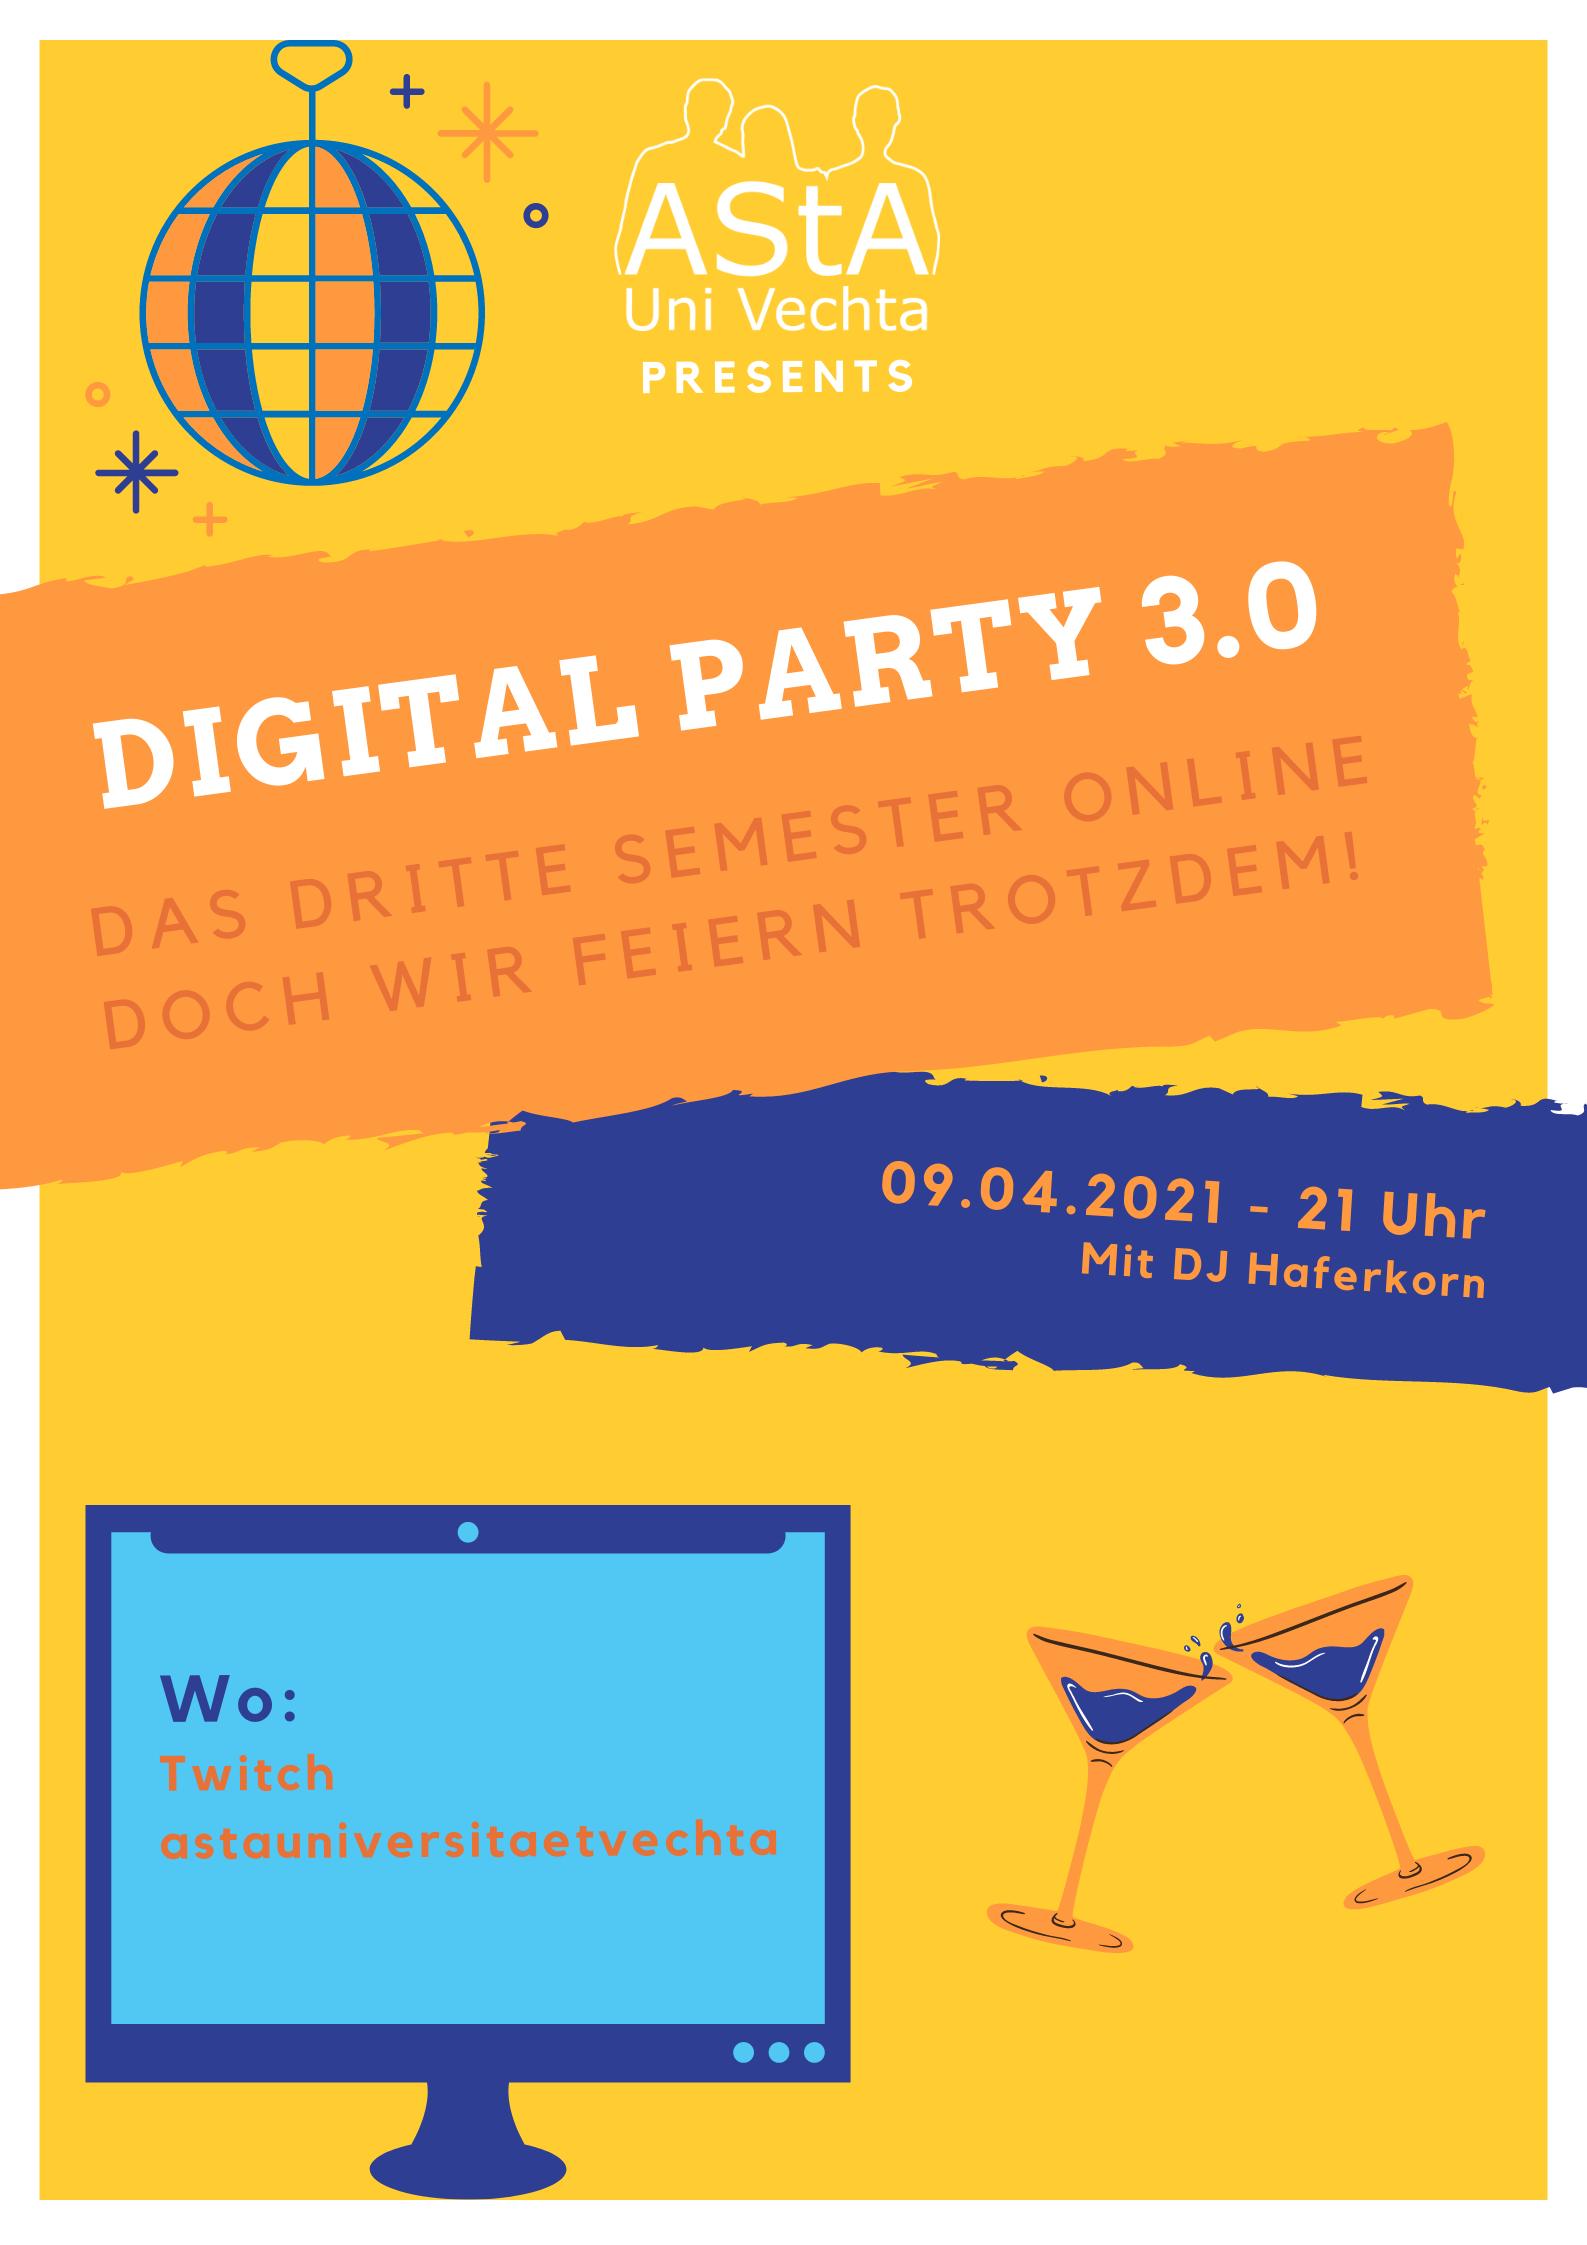 +++++Verschoben+++++ Digital Party 3.0 - Das dritte Semester online doch wir feiern trotzdem @ twitch.tv/astauniversitaetvechta